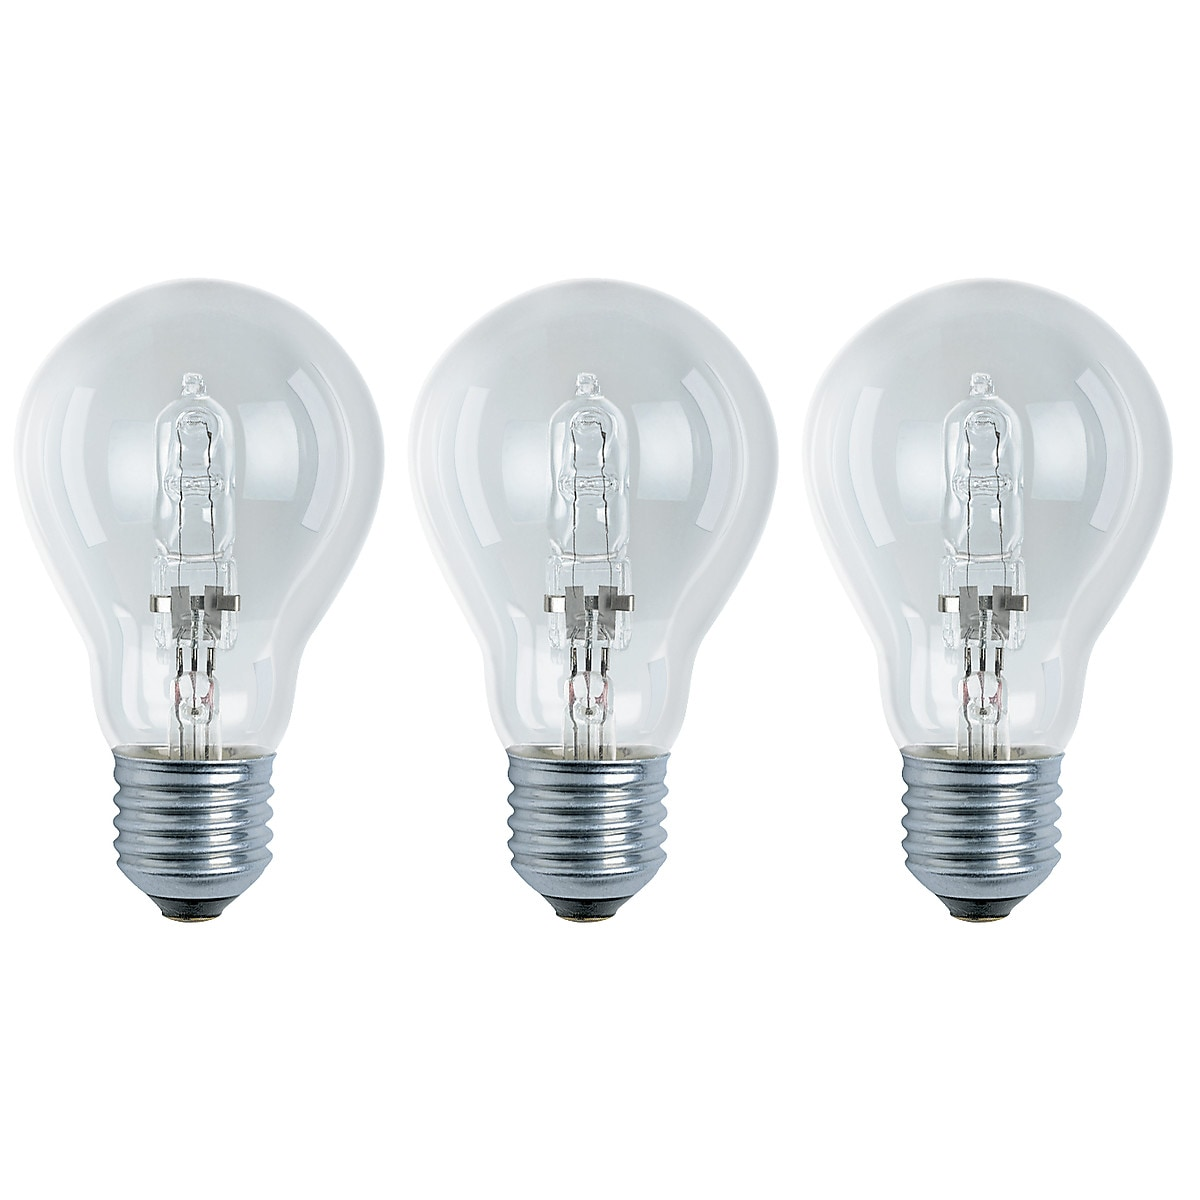 Halogenlampe Classic E27 Northlight 3er-Pack